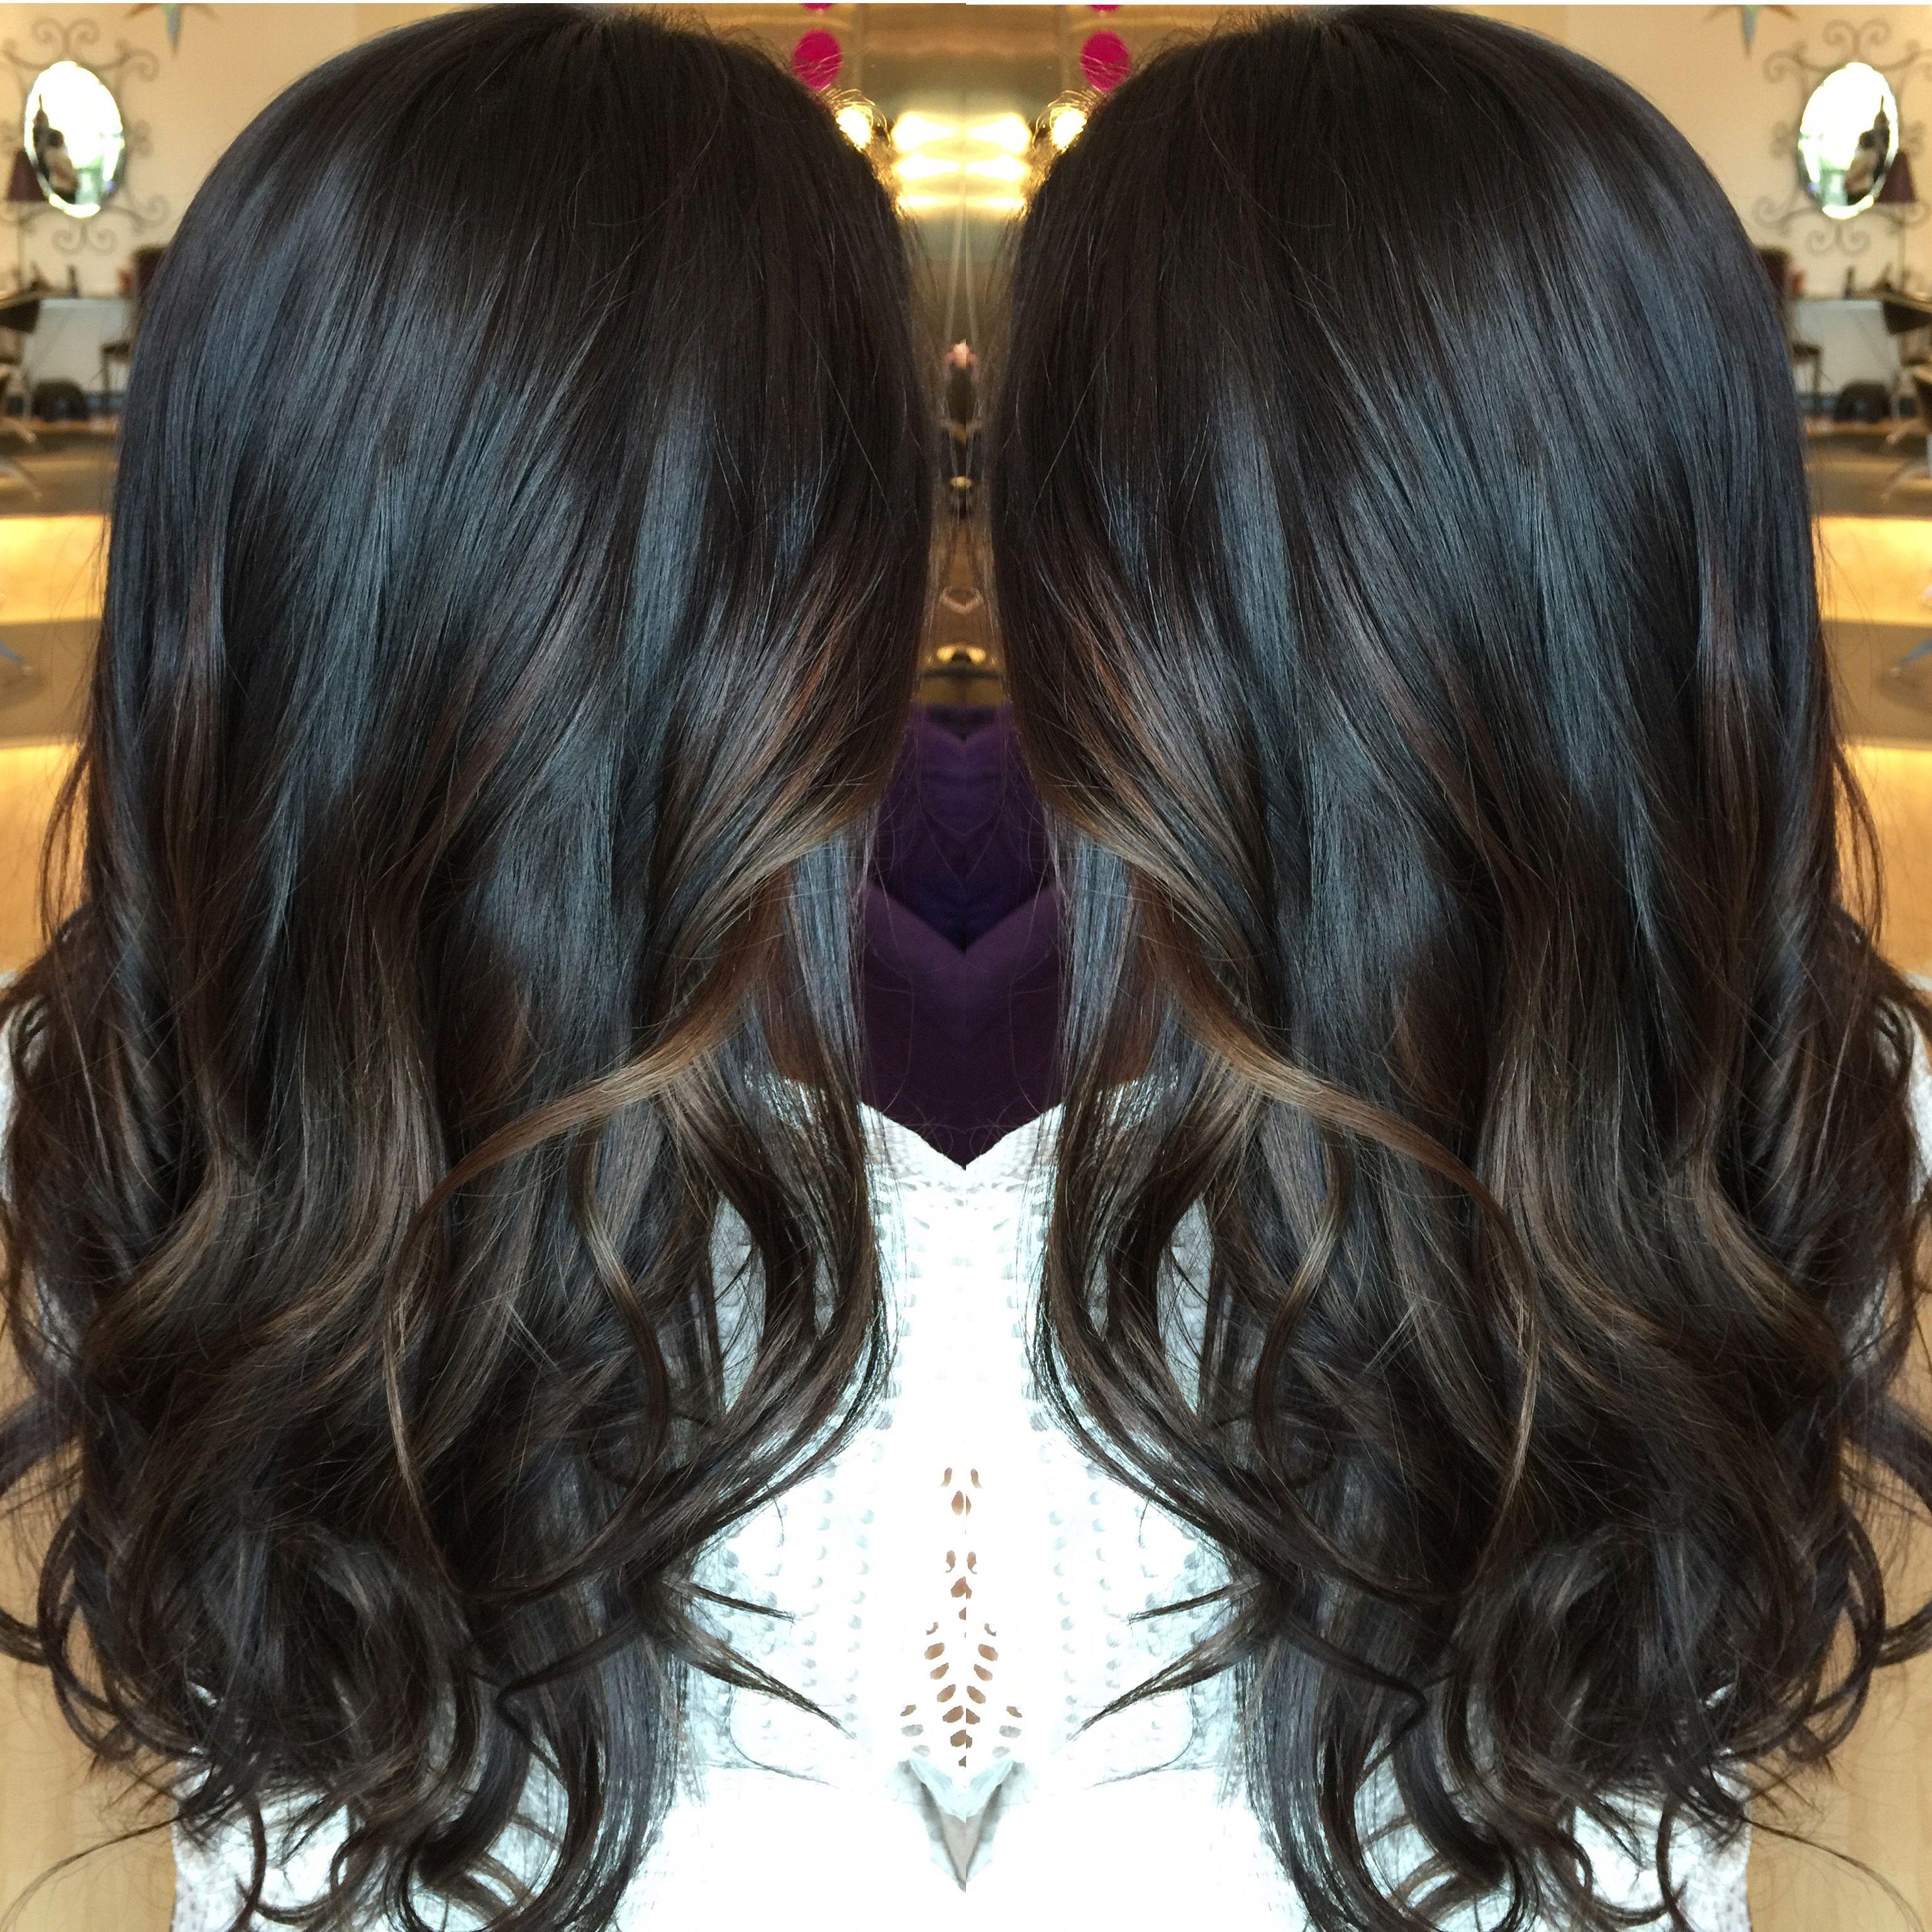 Subtle Bayalage For Dark Hair Thank You Cr Hair Black Hair Balayage Balayage Hair Hair